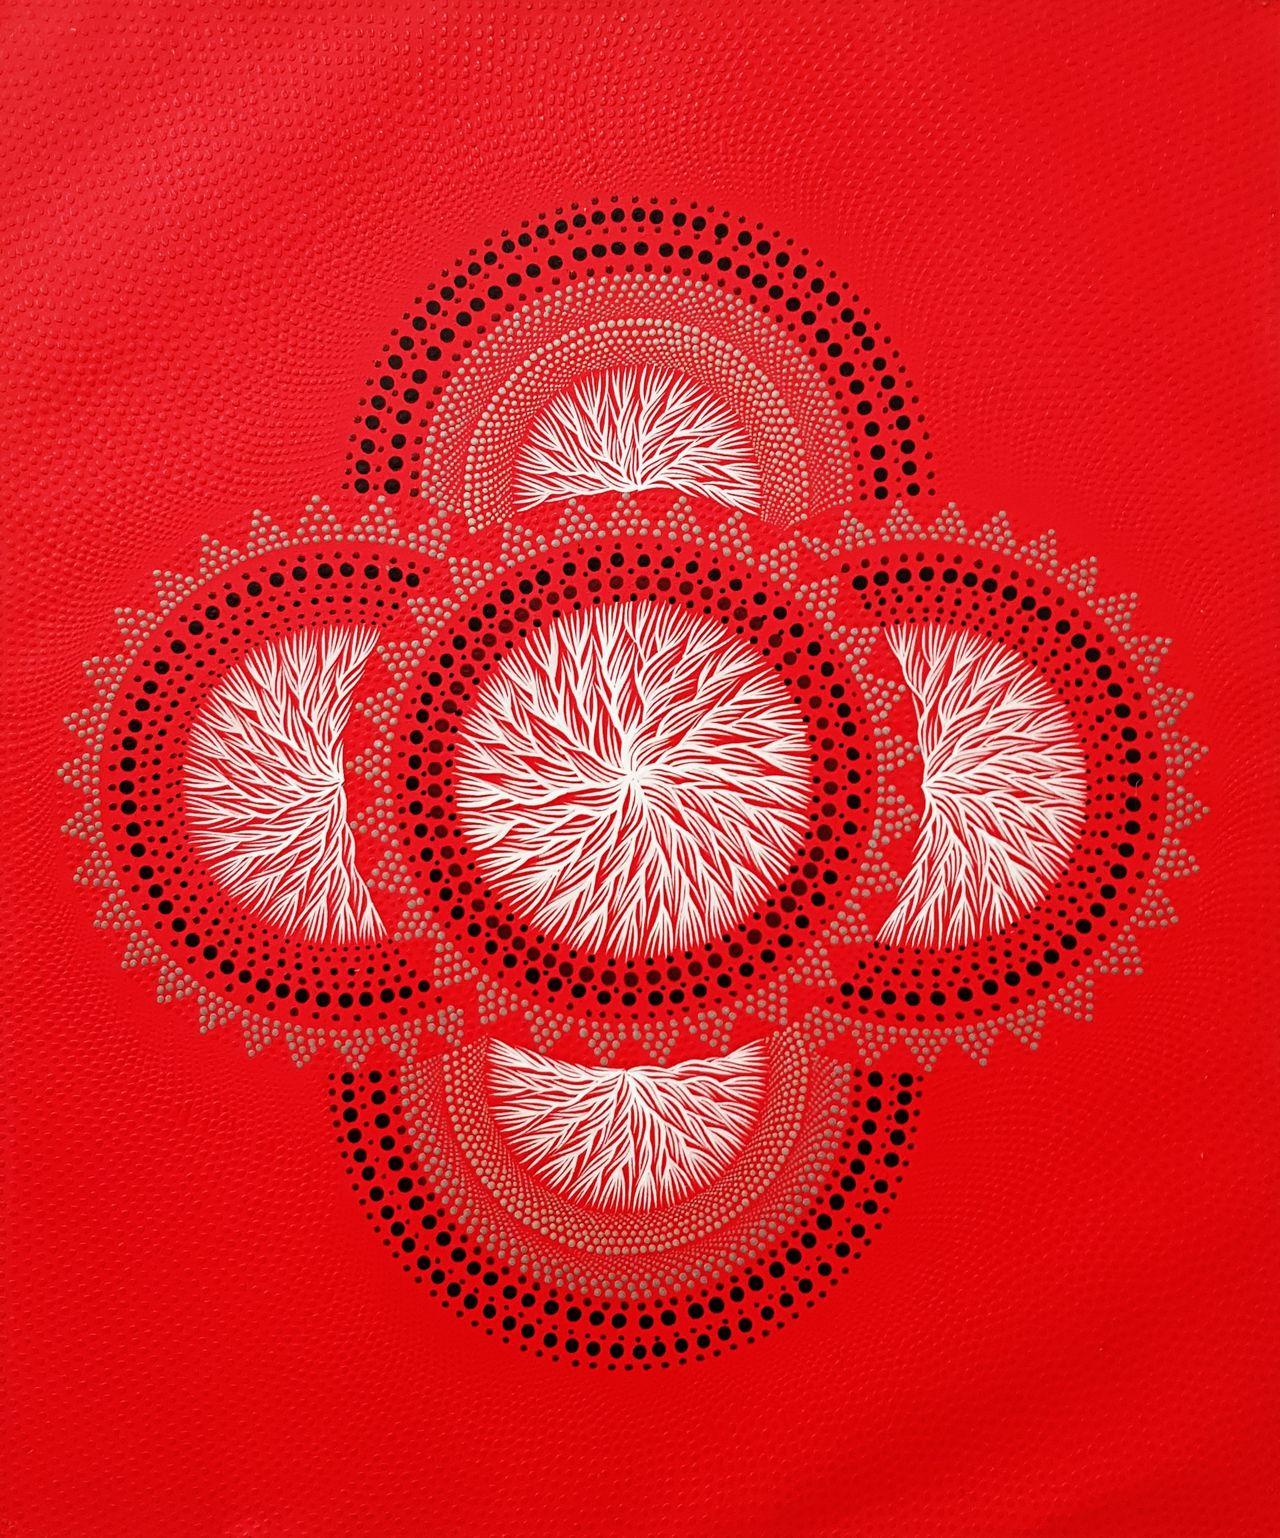 Mandala 2 MN3.jpg